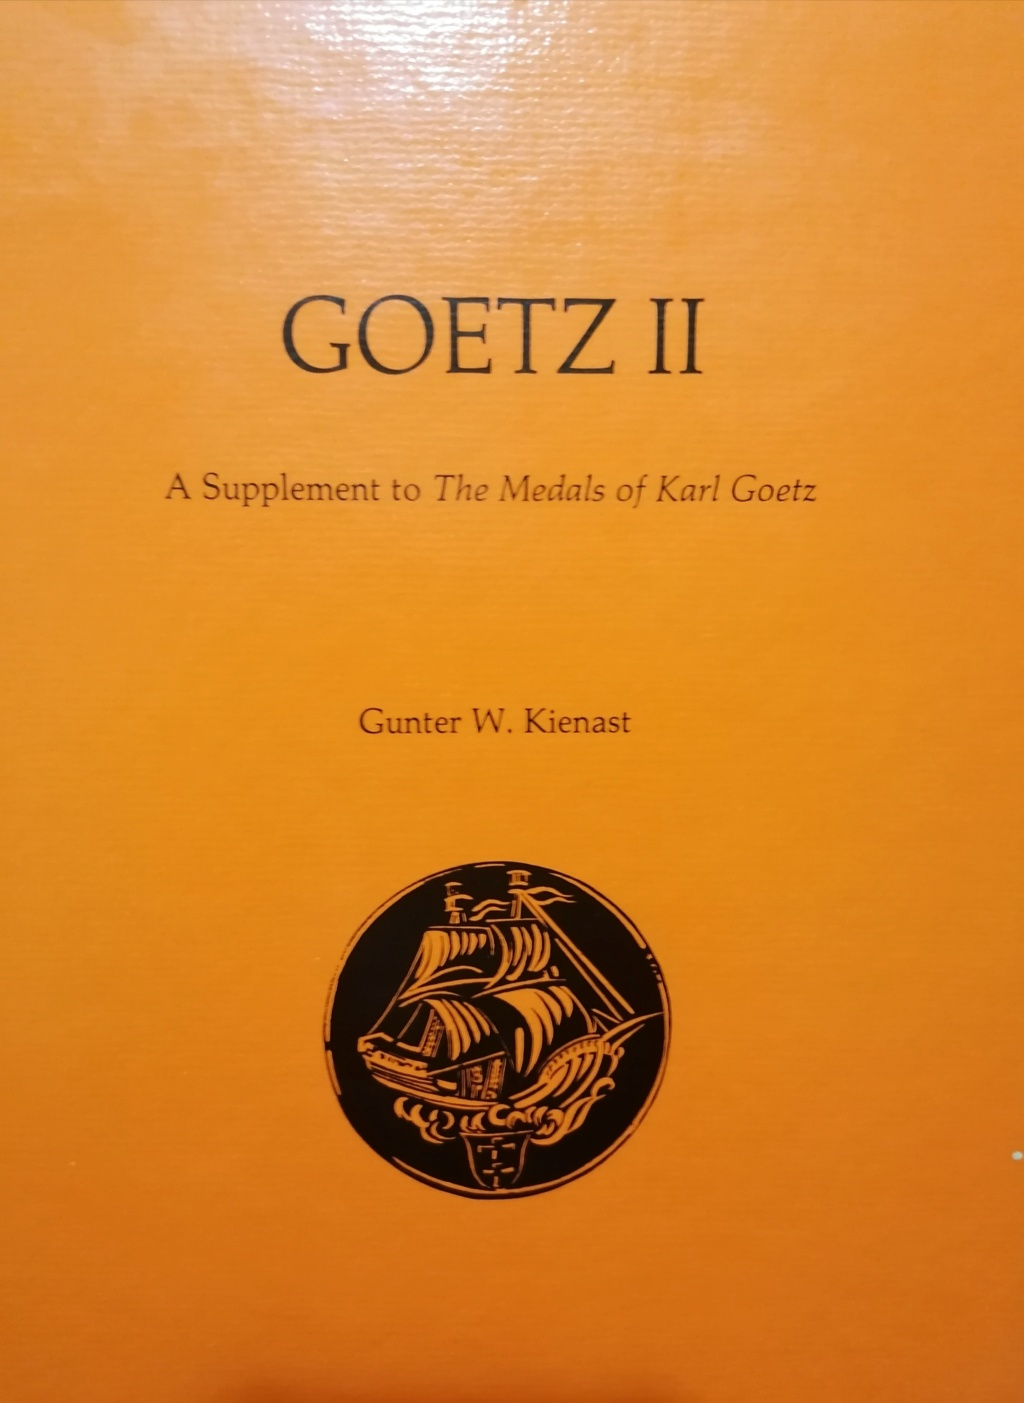 Alemania - Bielefeld - 1 Goldmark 1923 - Página 2 Img_2162